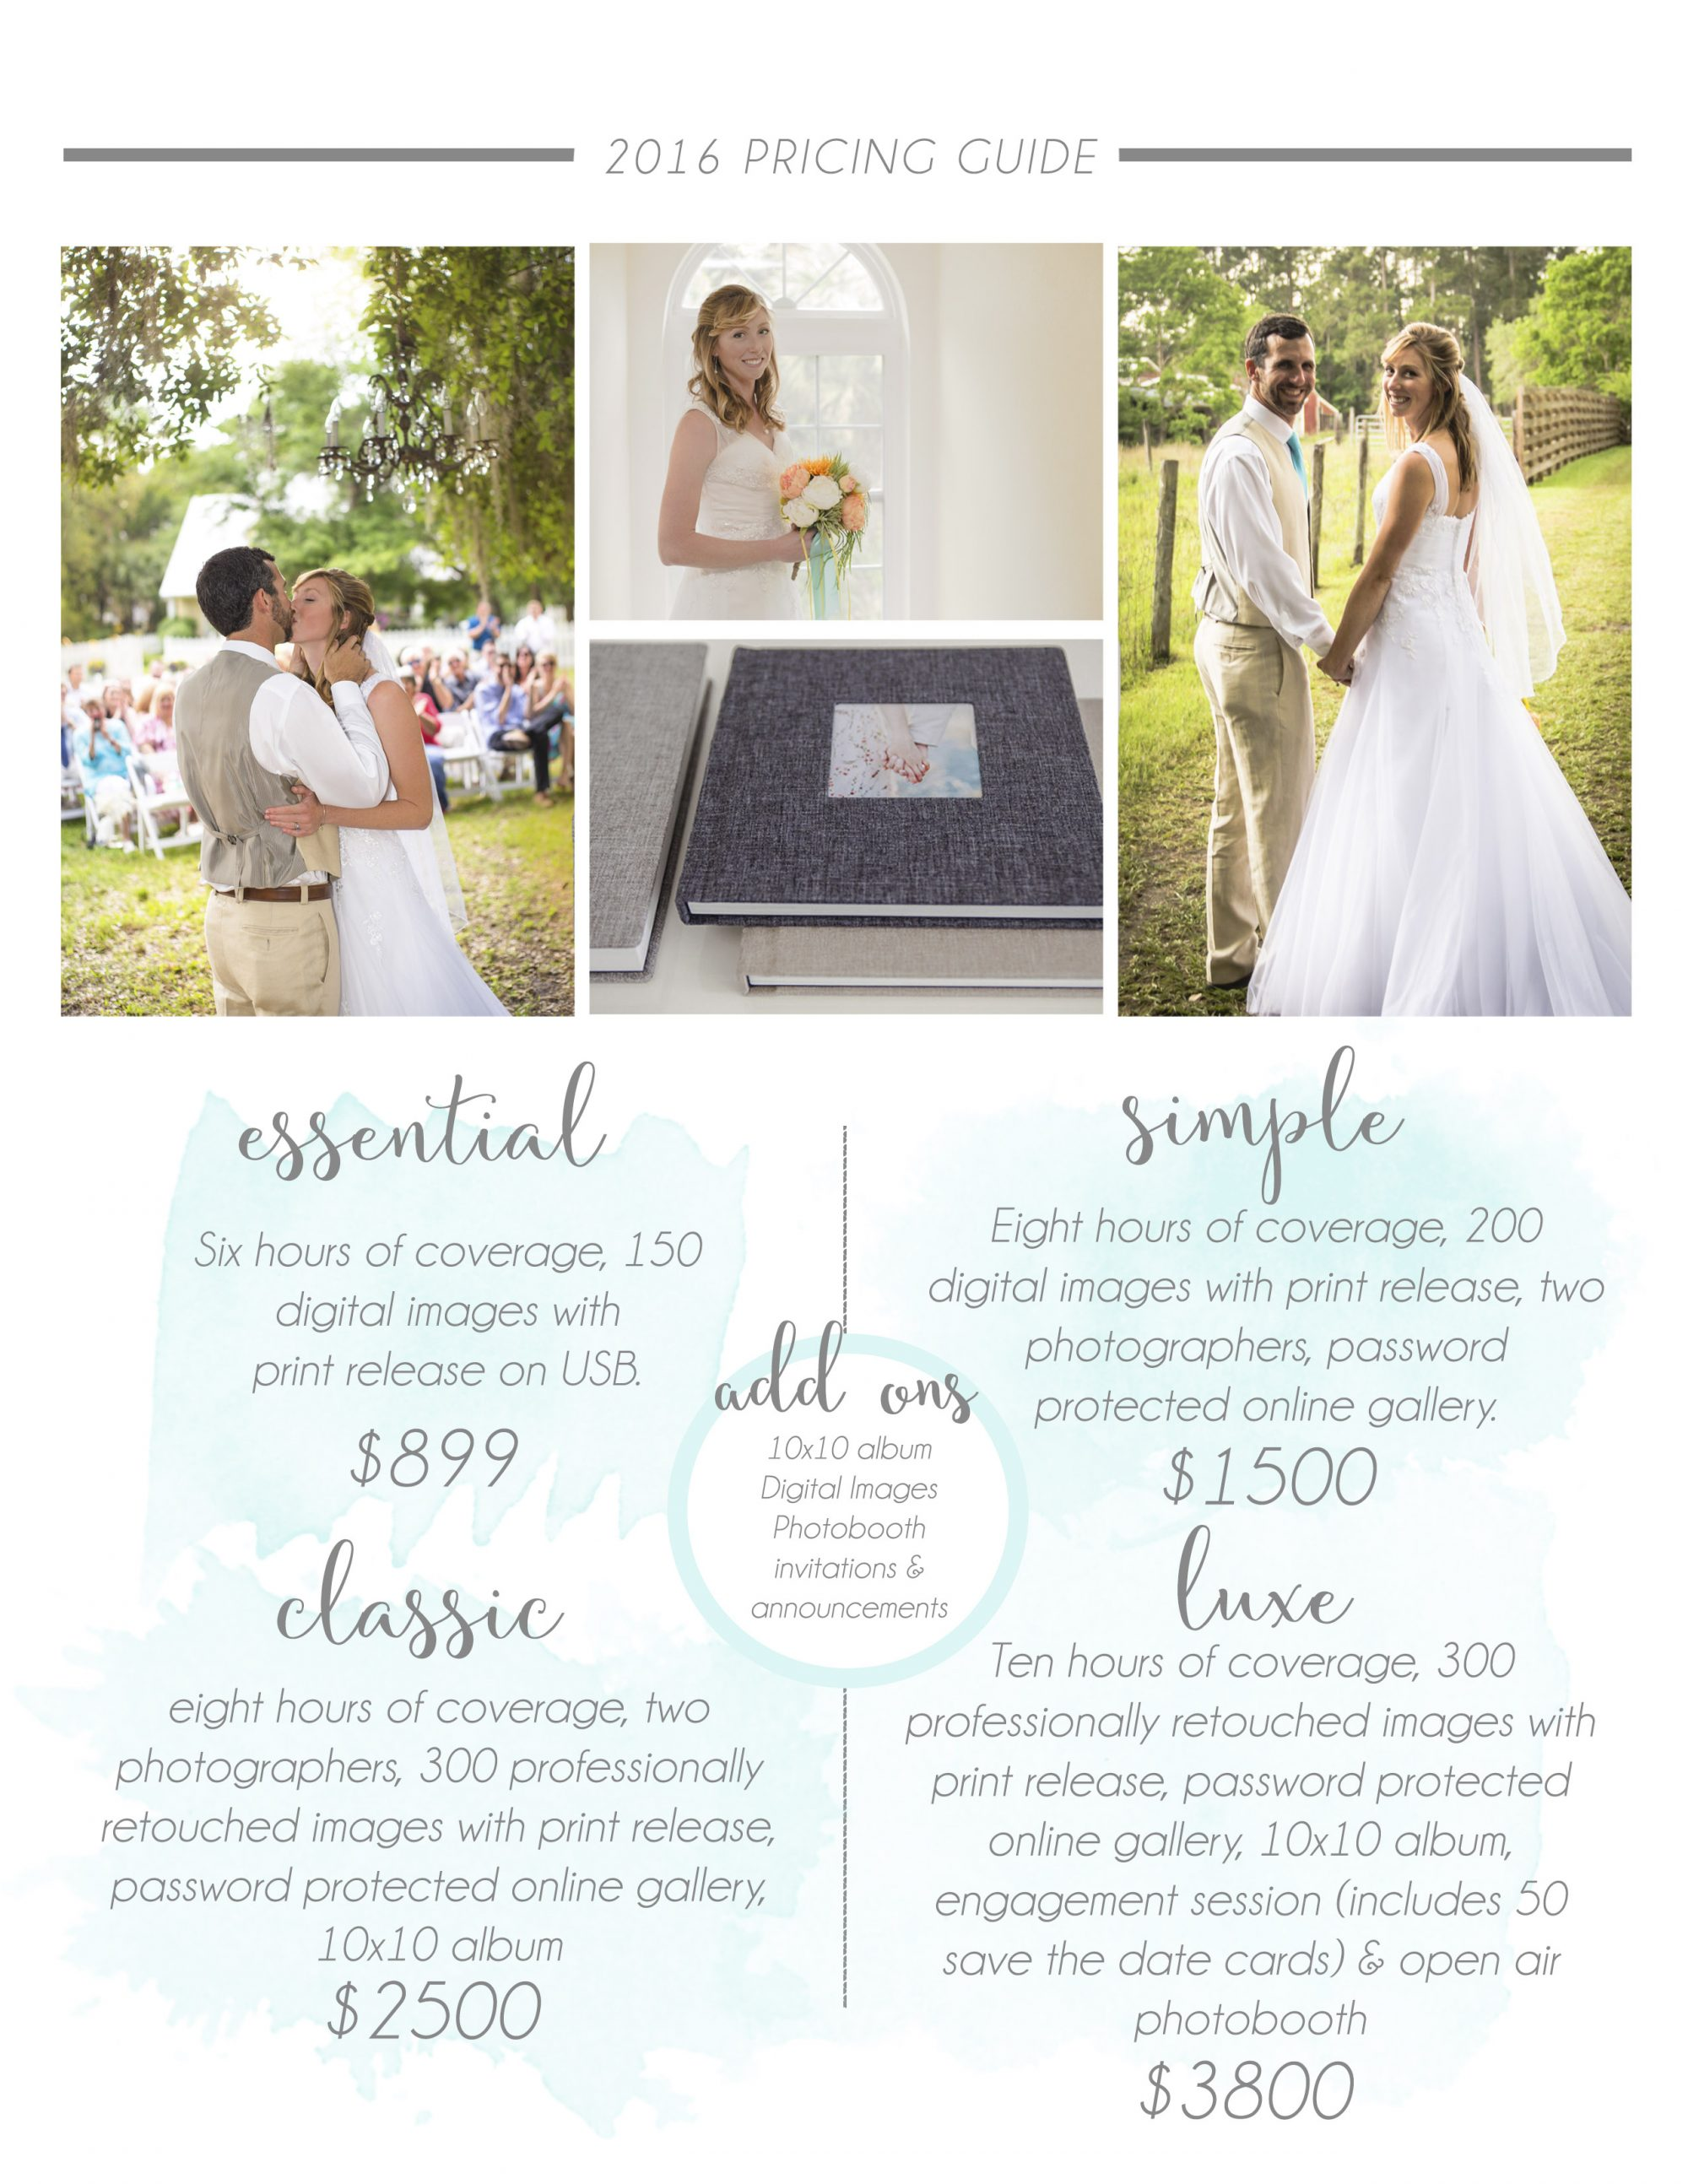 Wedding Photography 2016 Pricing Daytona Beach Photographer Wedding Photographer Daytona Beach Professional Photographer Daytona Beach Hinson Photography